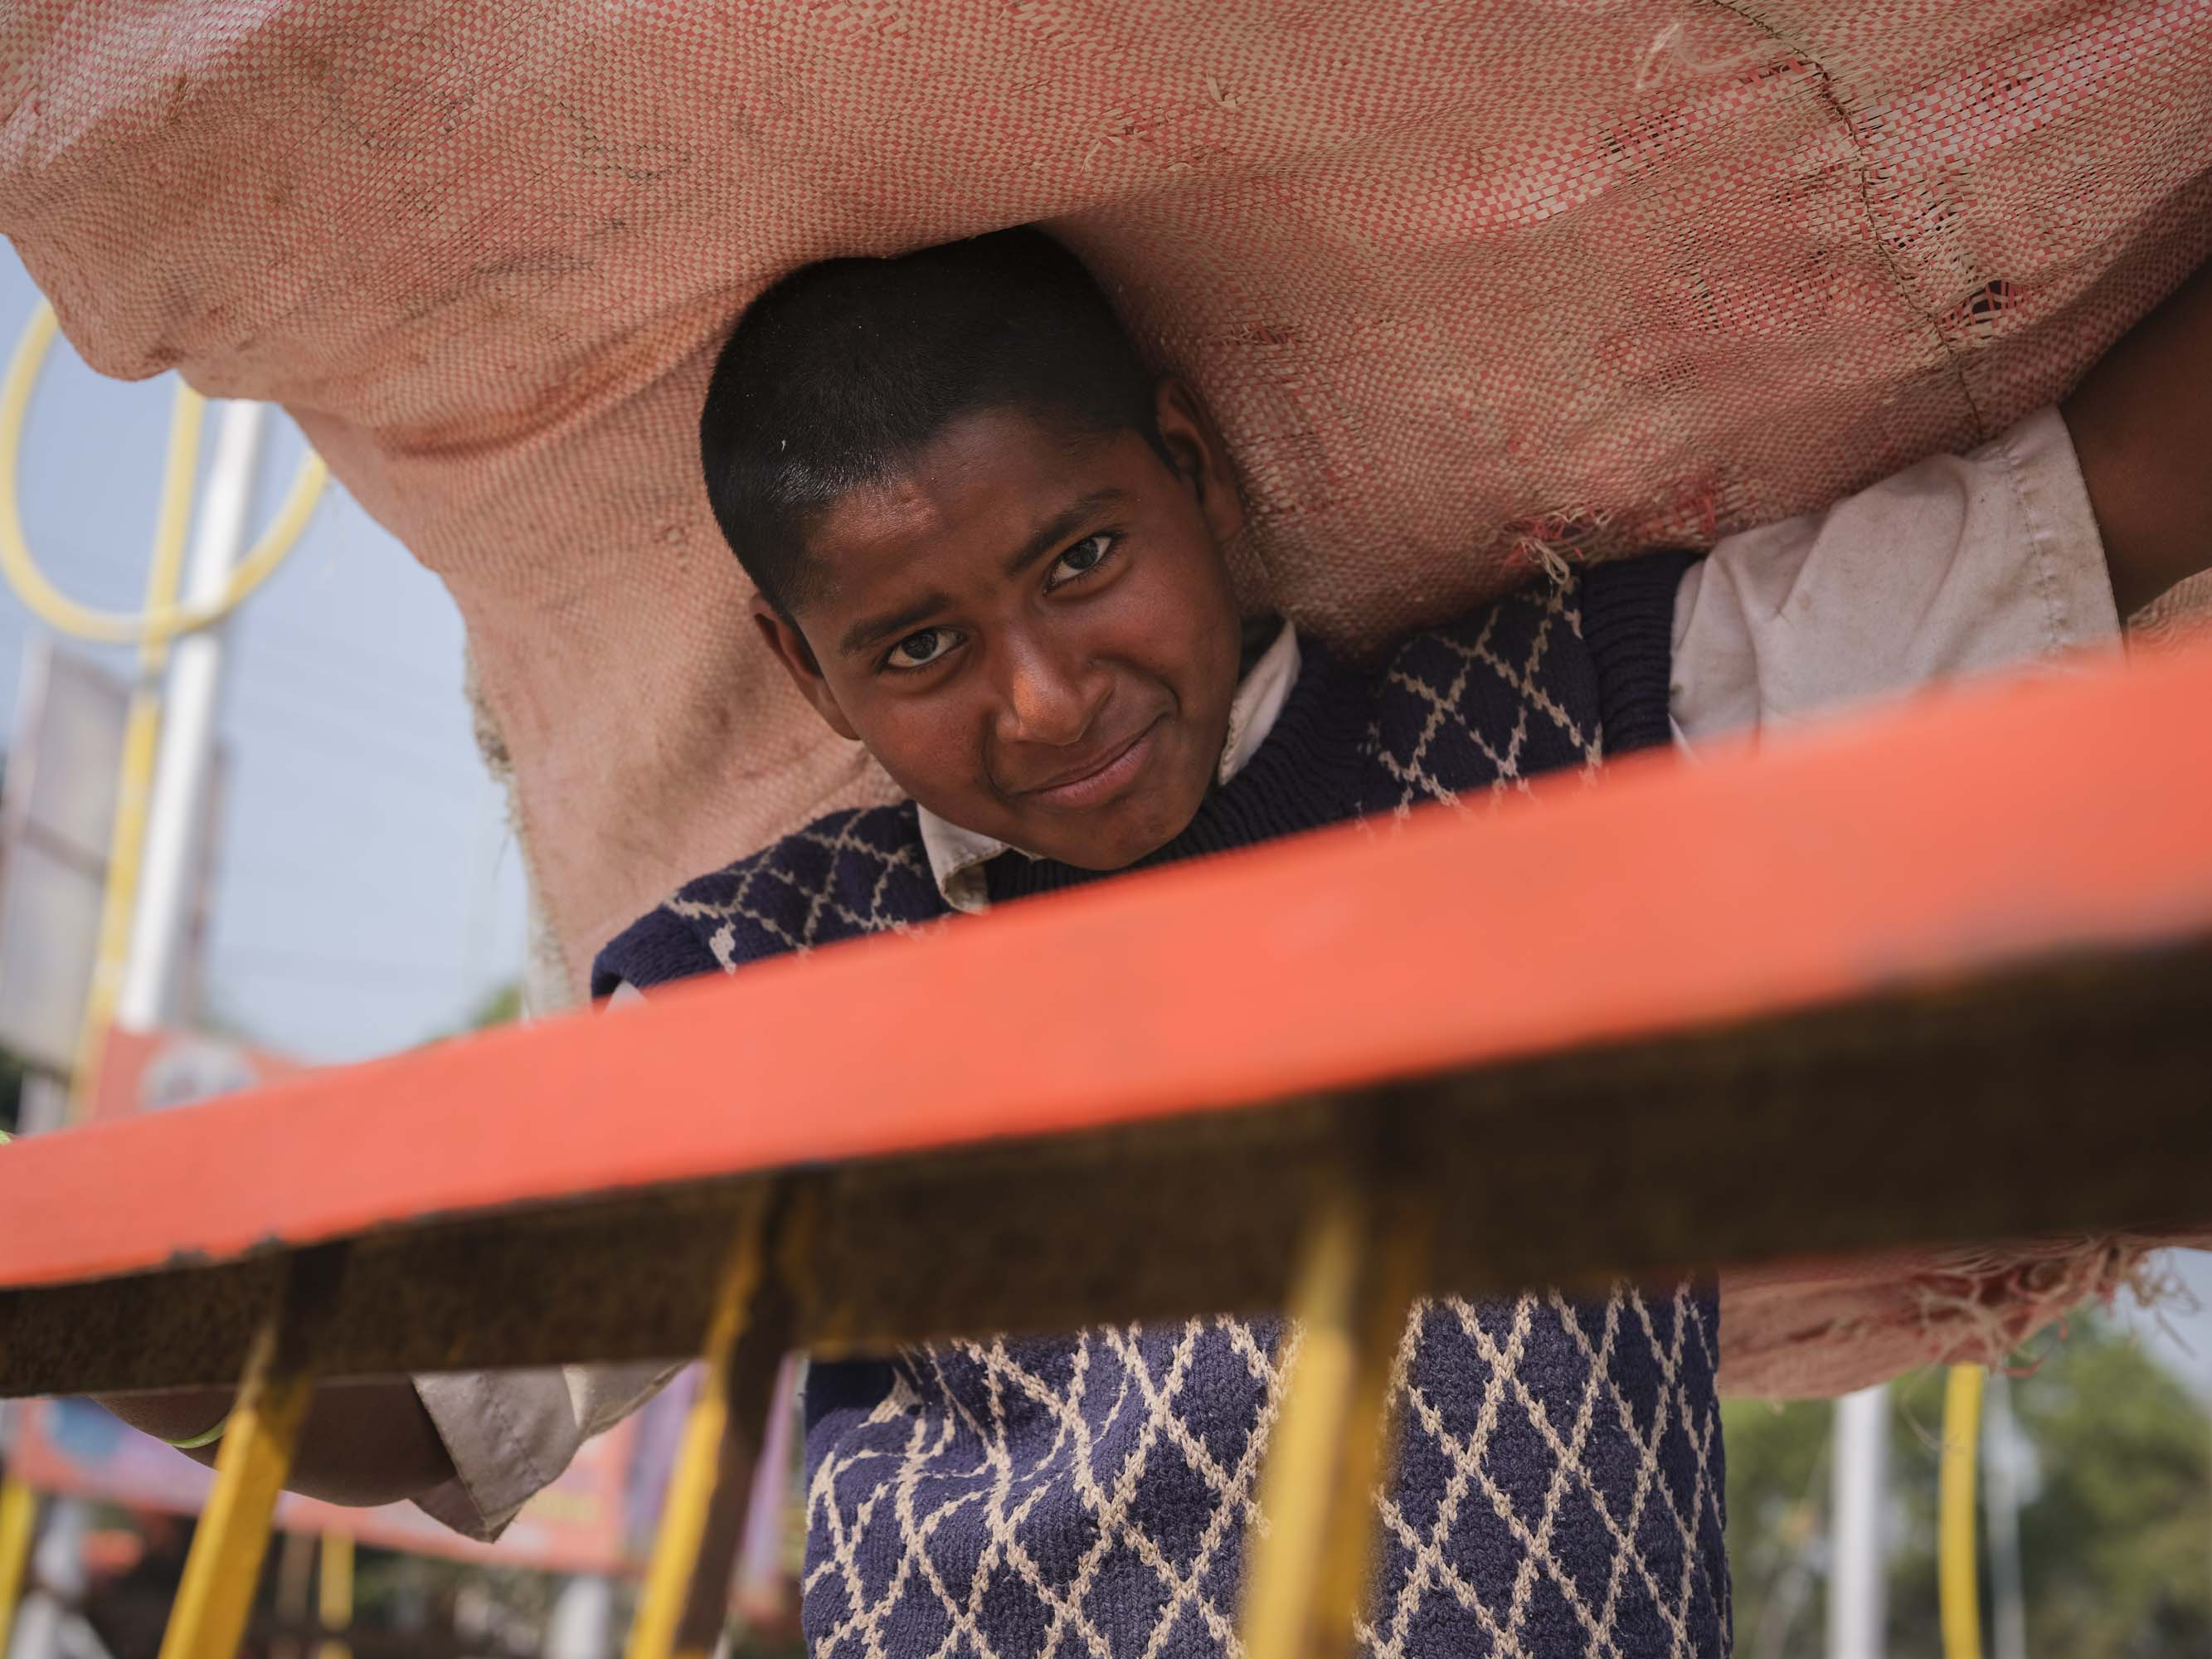 kid working pilgrims Kumbh mela 2019 India Allahabad Prayagraj Ardh hindu religious Festival event rivers photographer jose jeuland photography